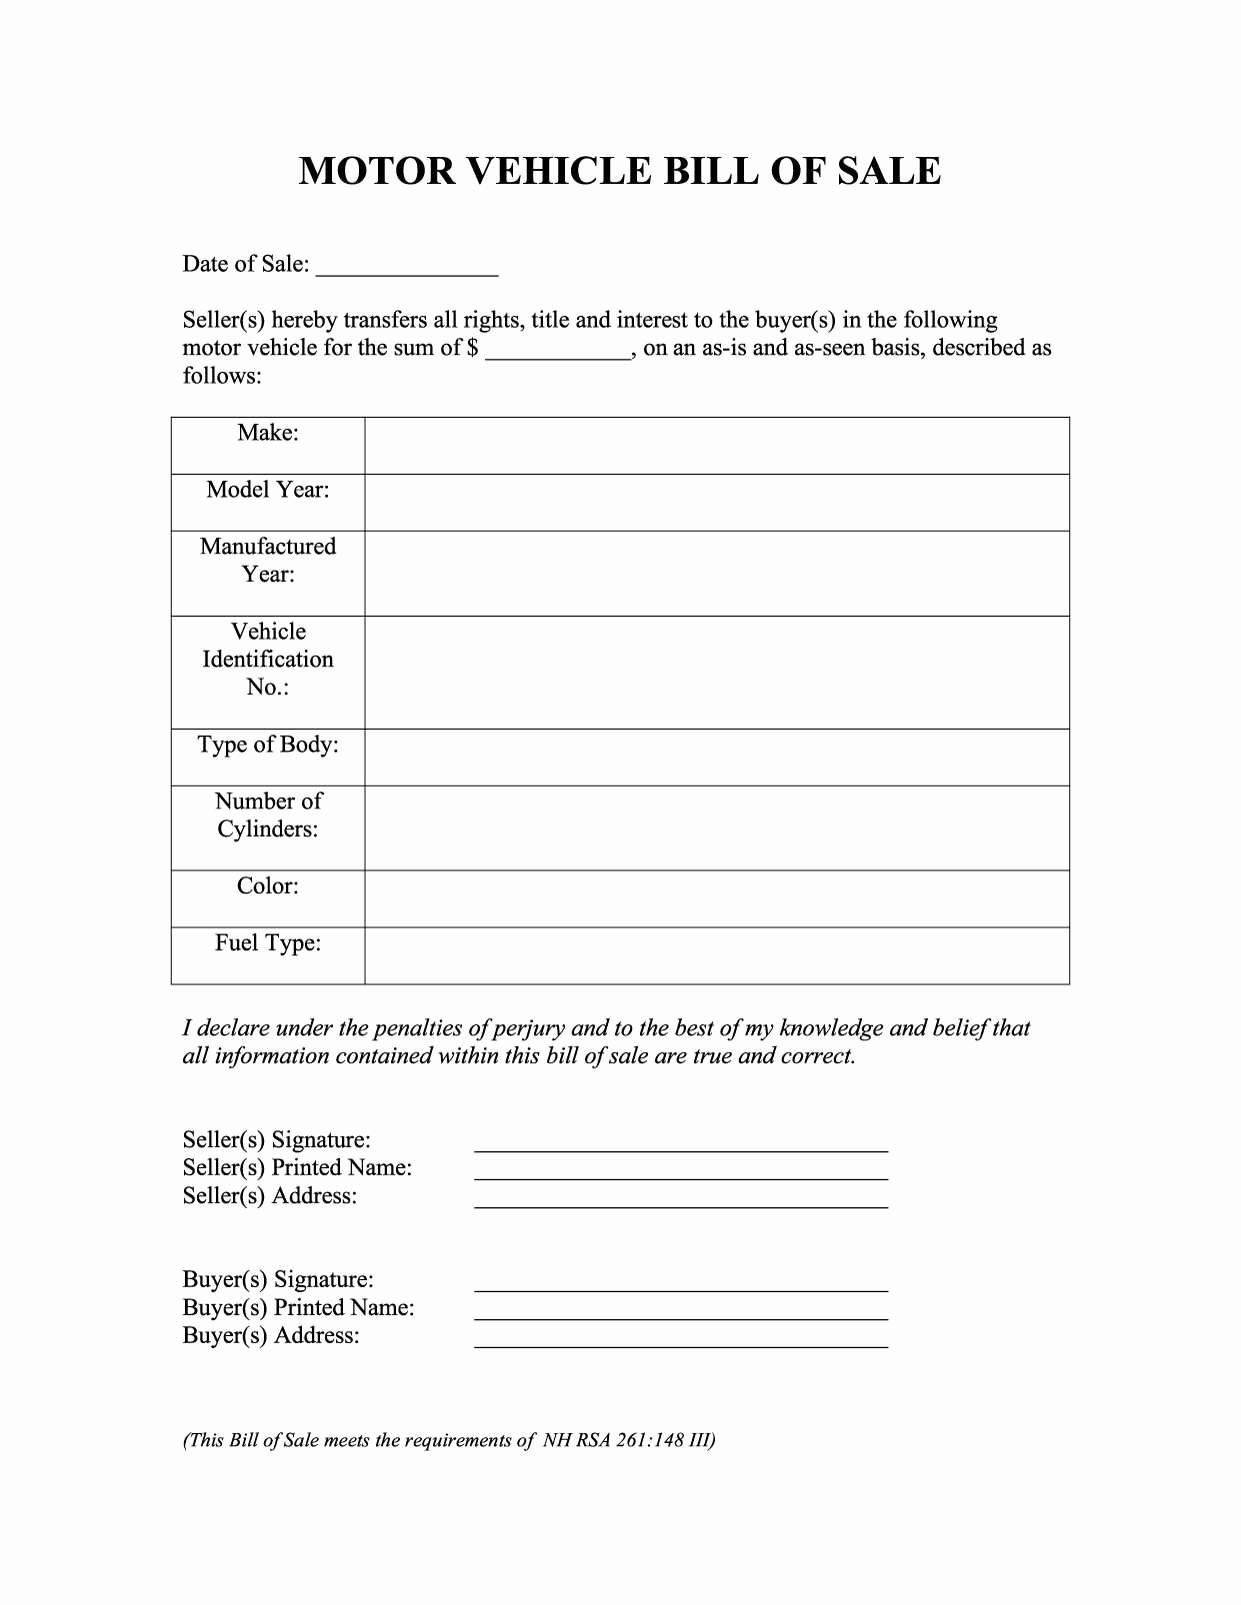 Free Template Bill Of Sale New 46 Fee Printable Bill Of Sale Templates Car Boat Gun